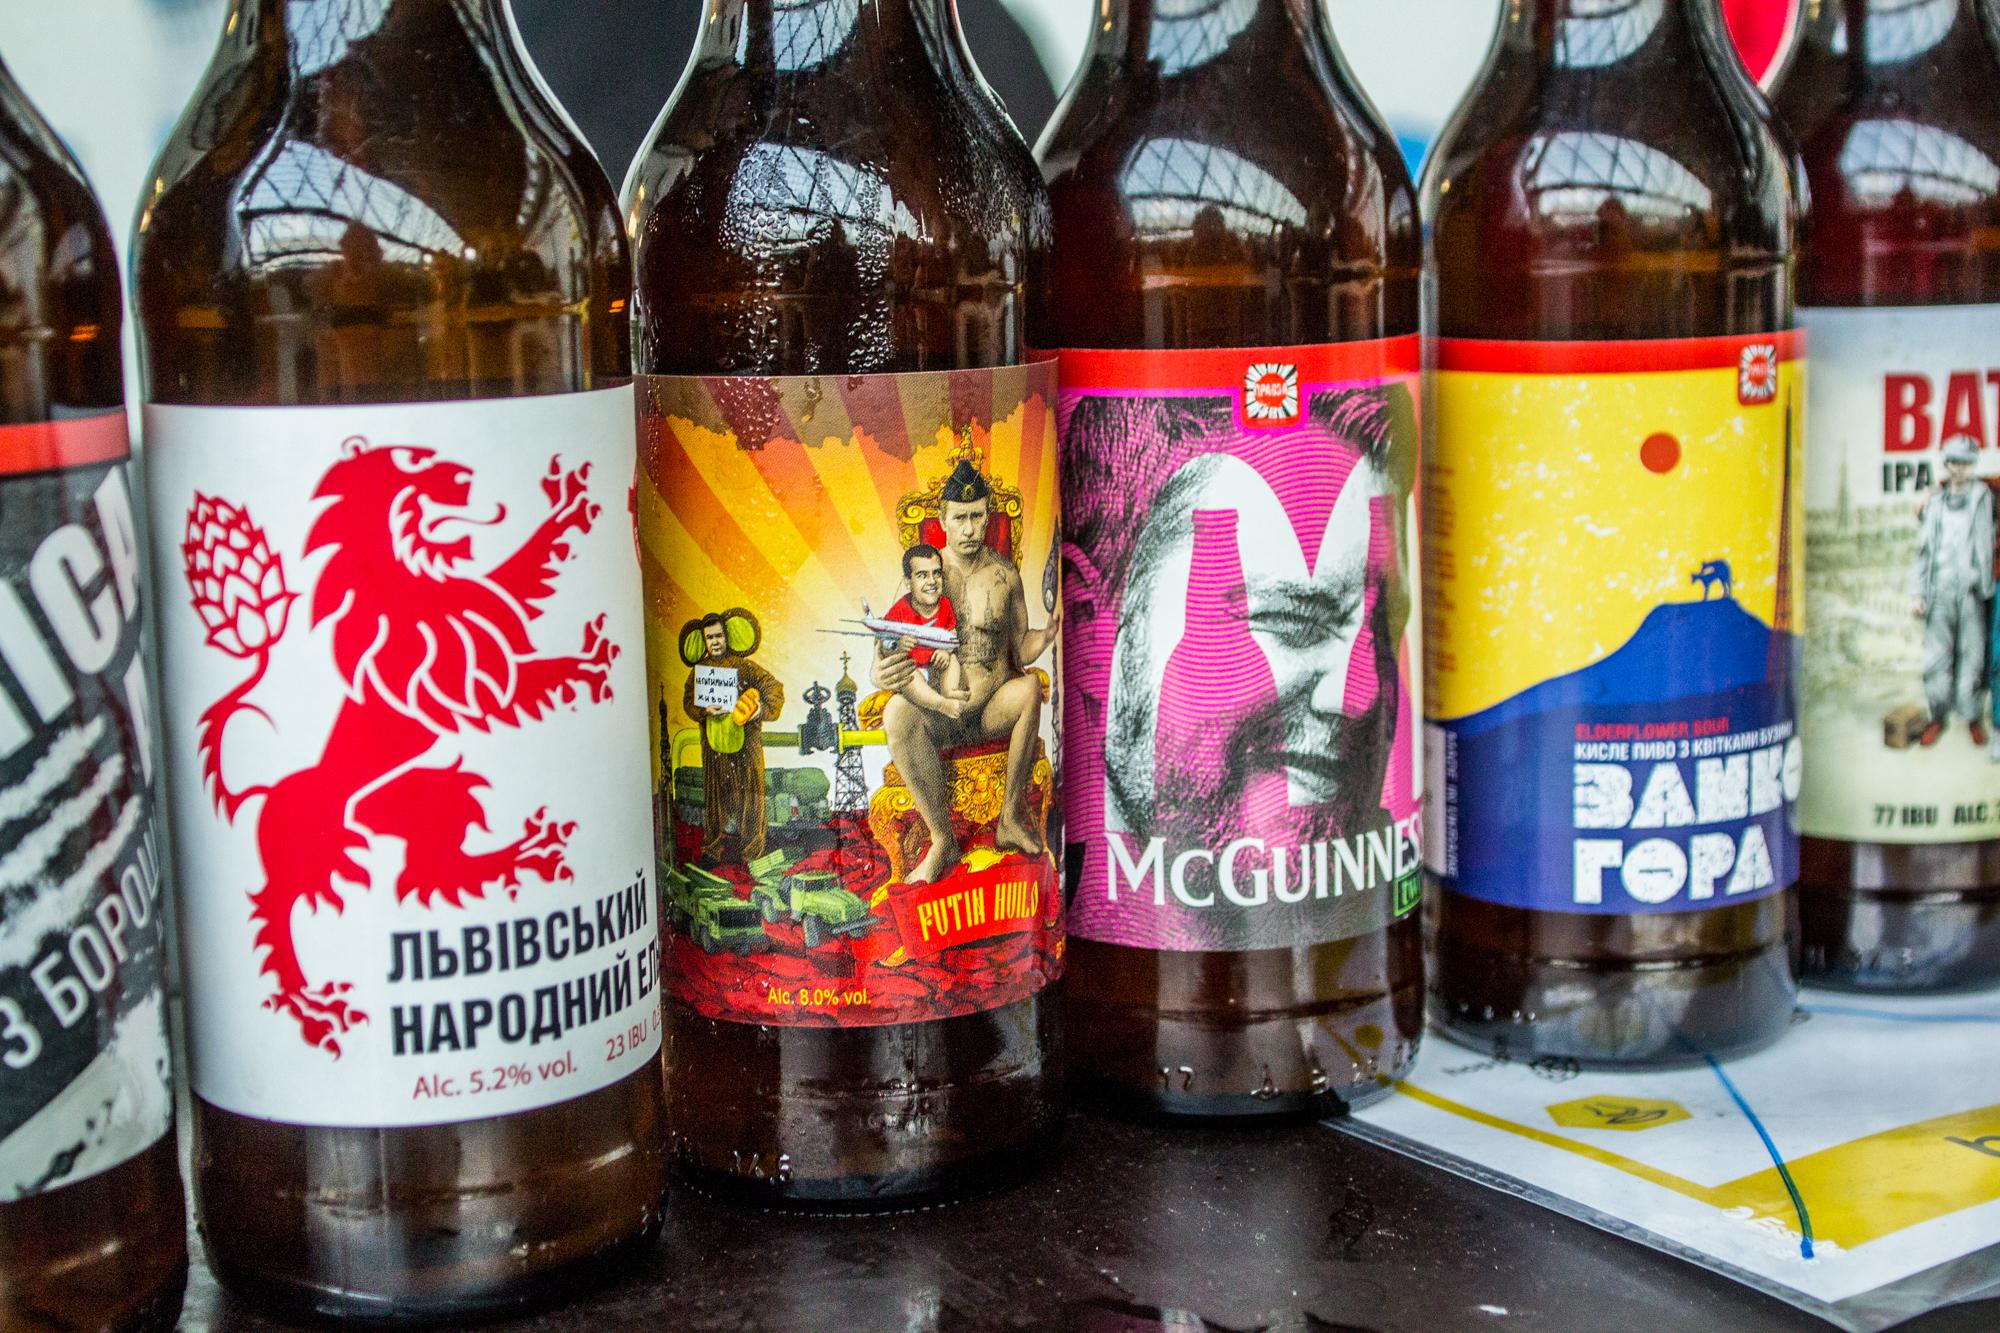 bxl beerfest (4 of 10)